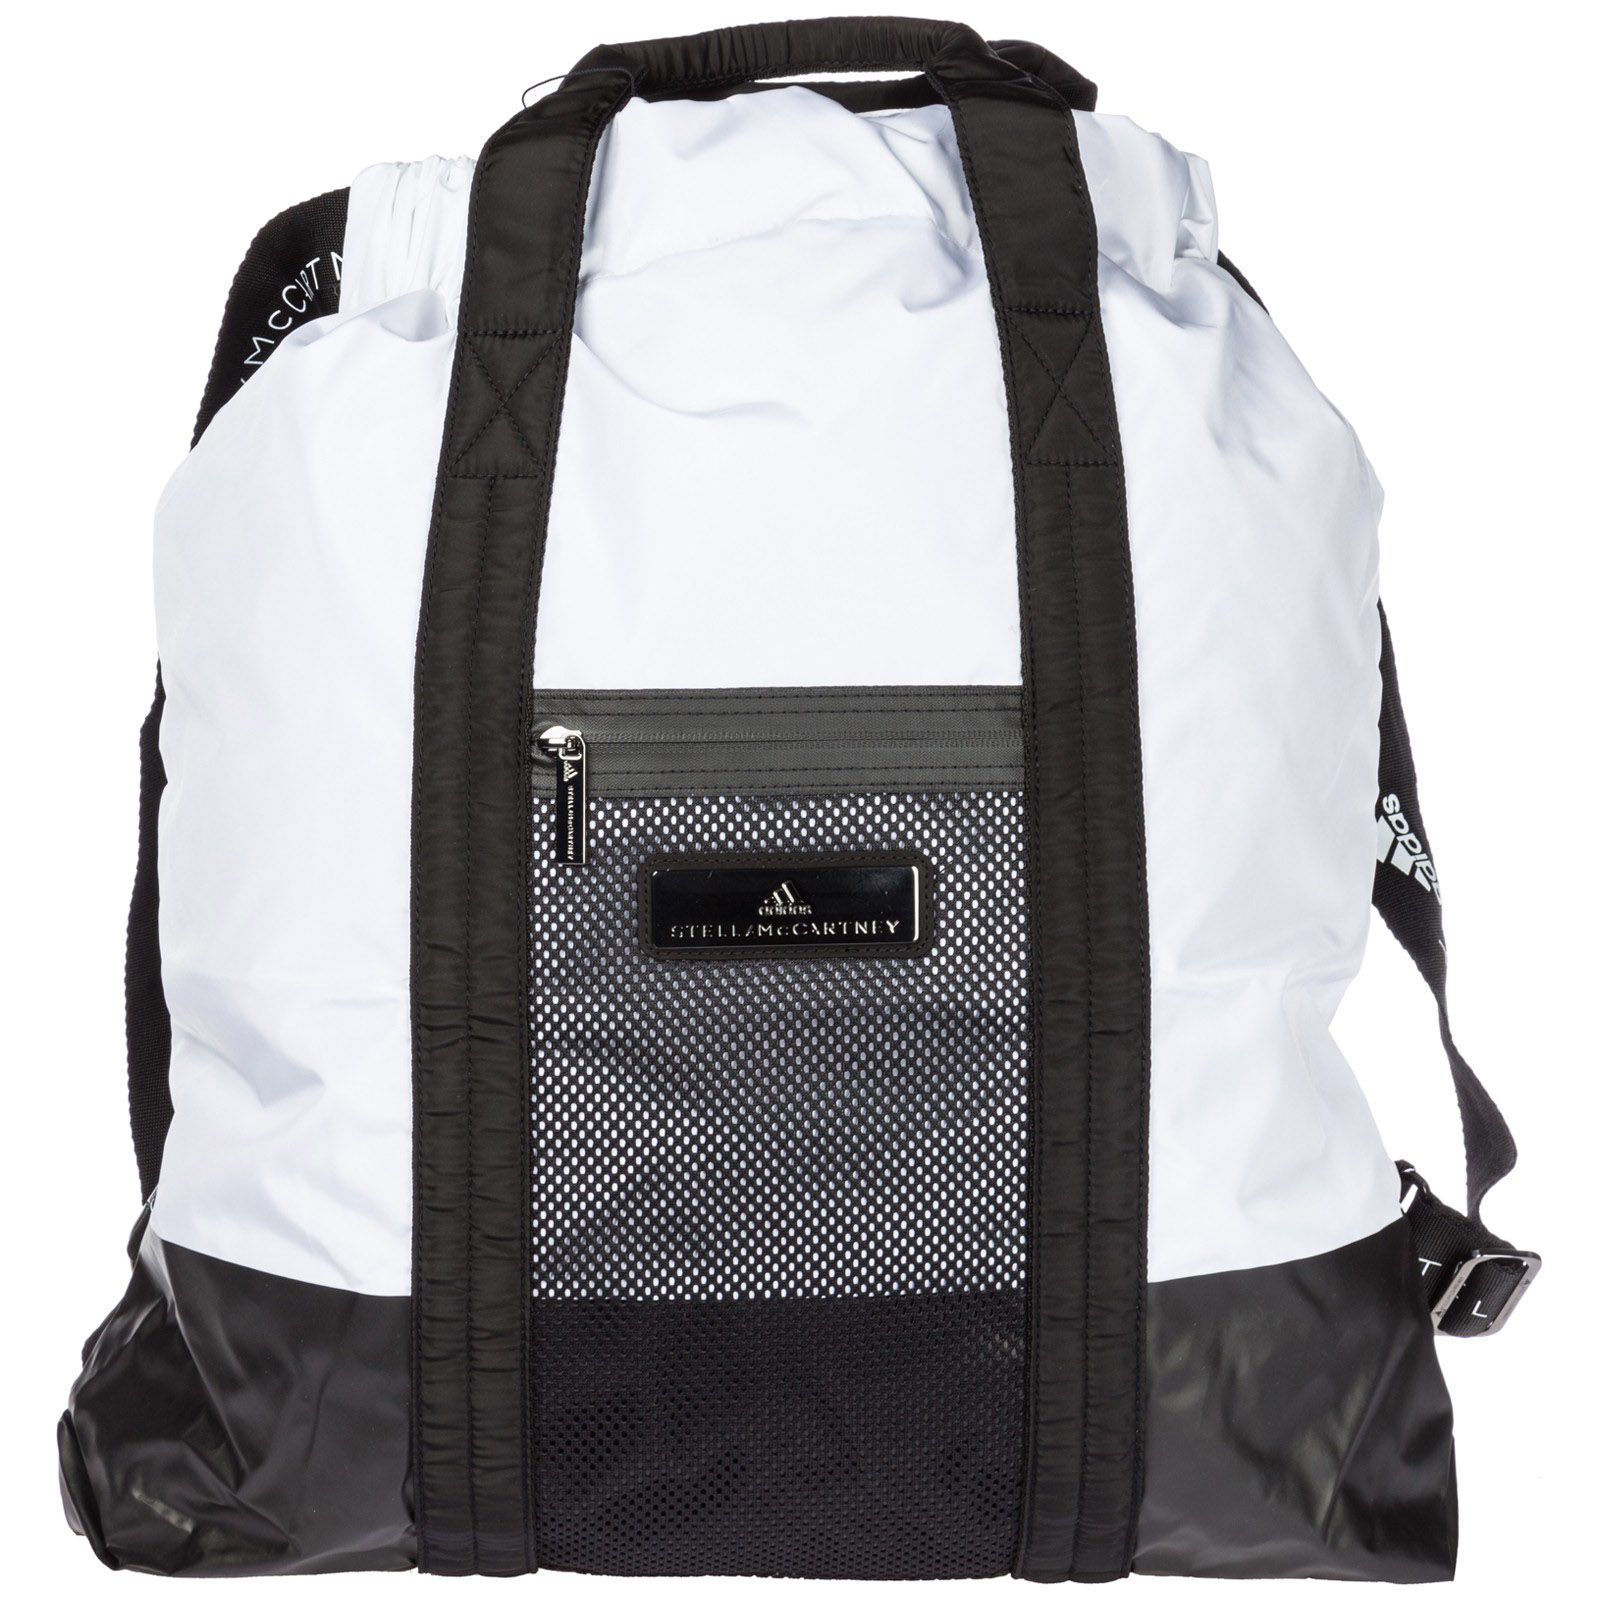 Adidas by Stella McCartney Women s rucksack backpack travel 875011755